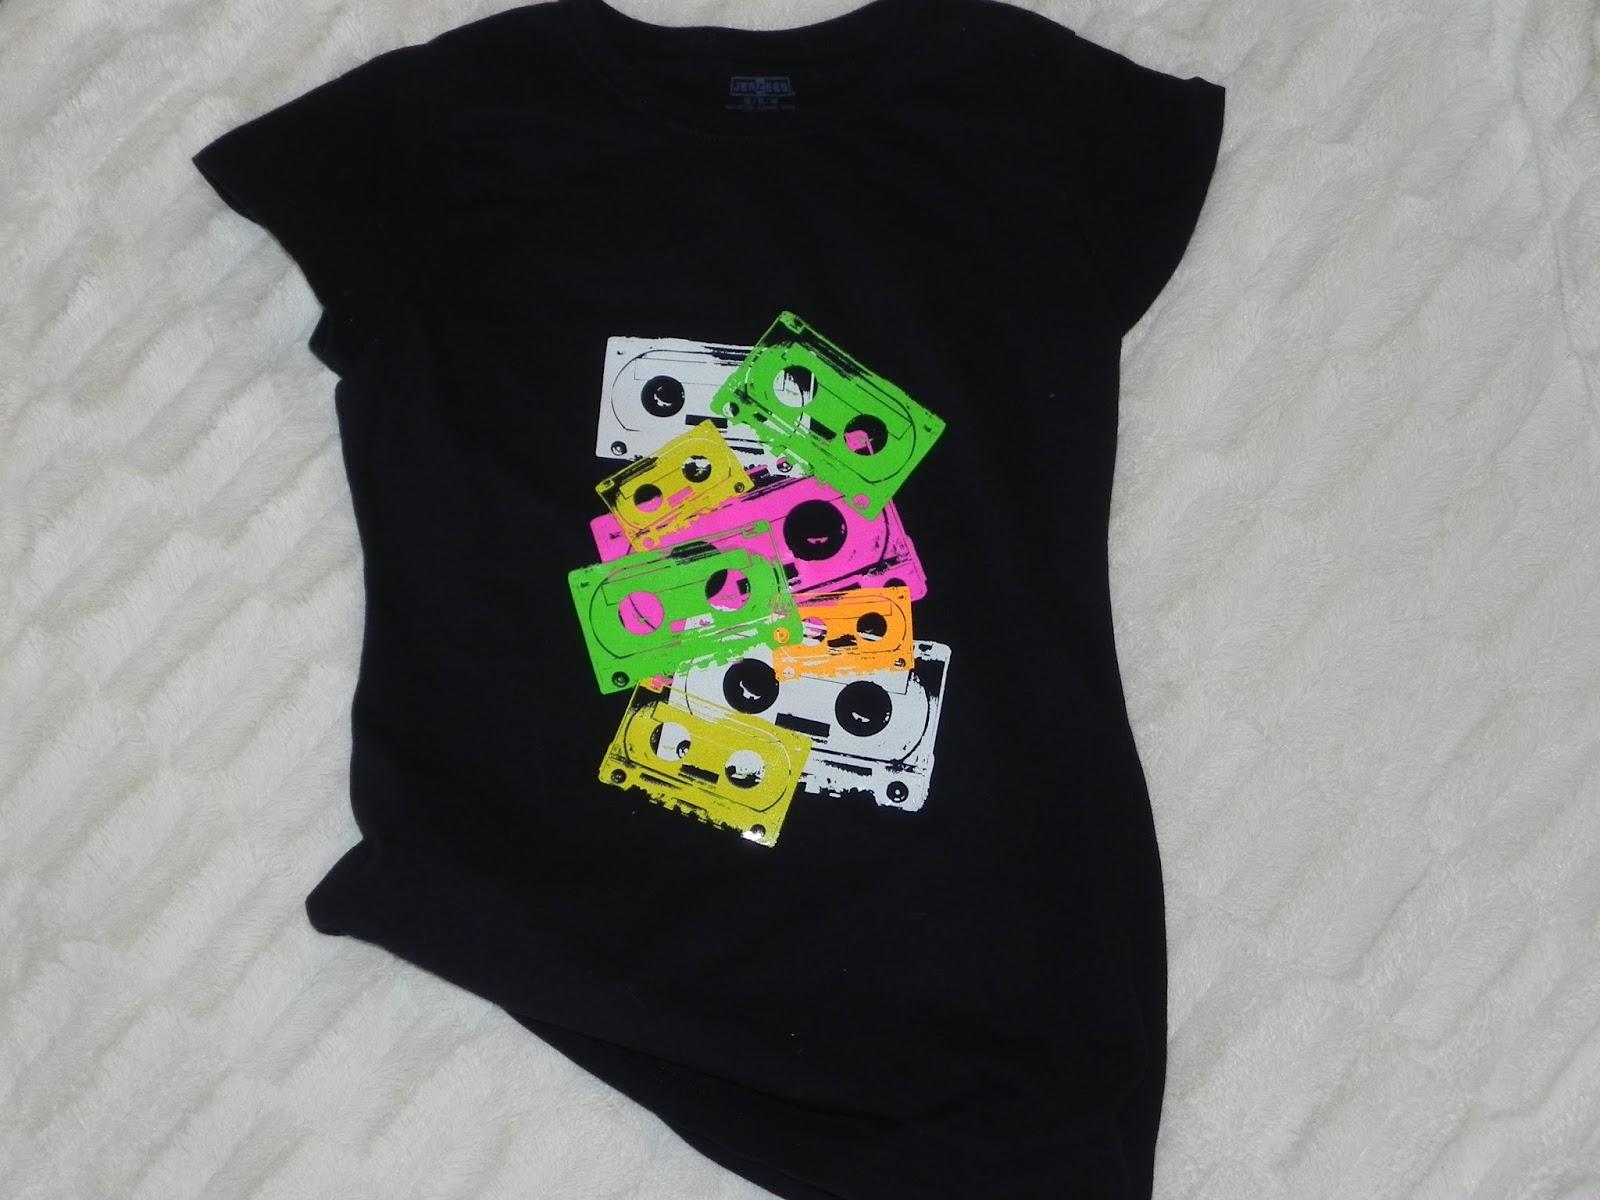 Smart n snazzy diy neon mix tape print t shirt for Diy tee shirt printing